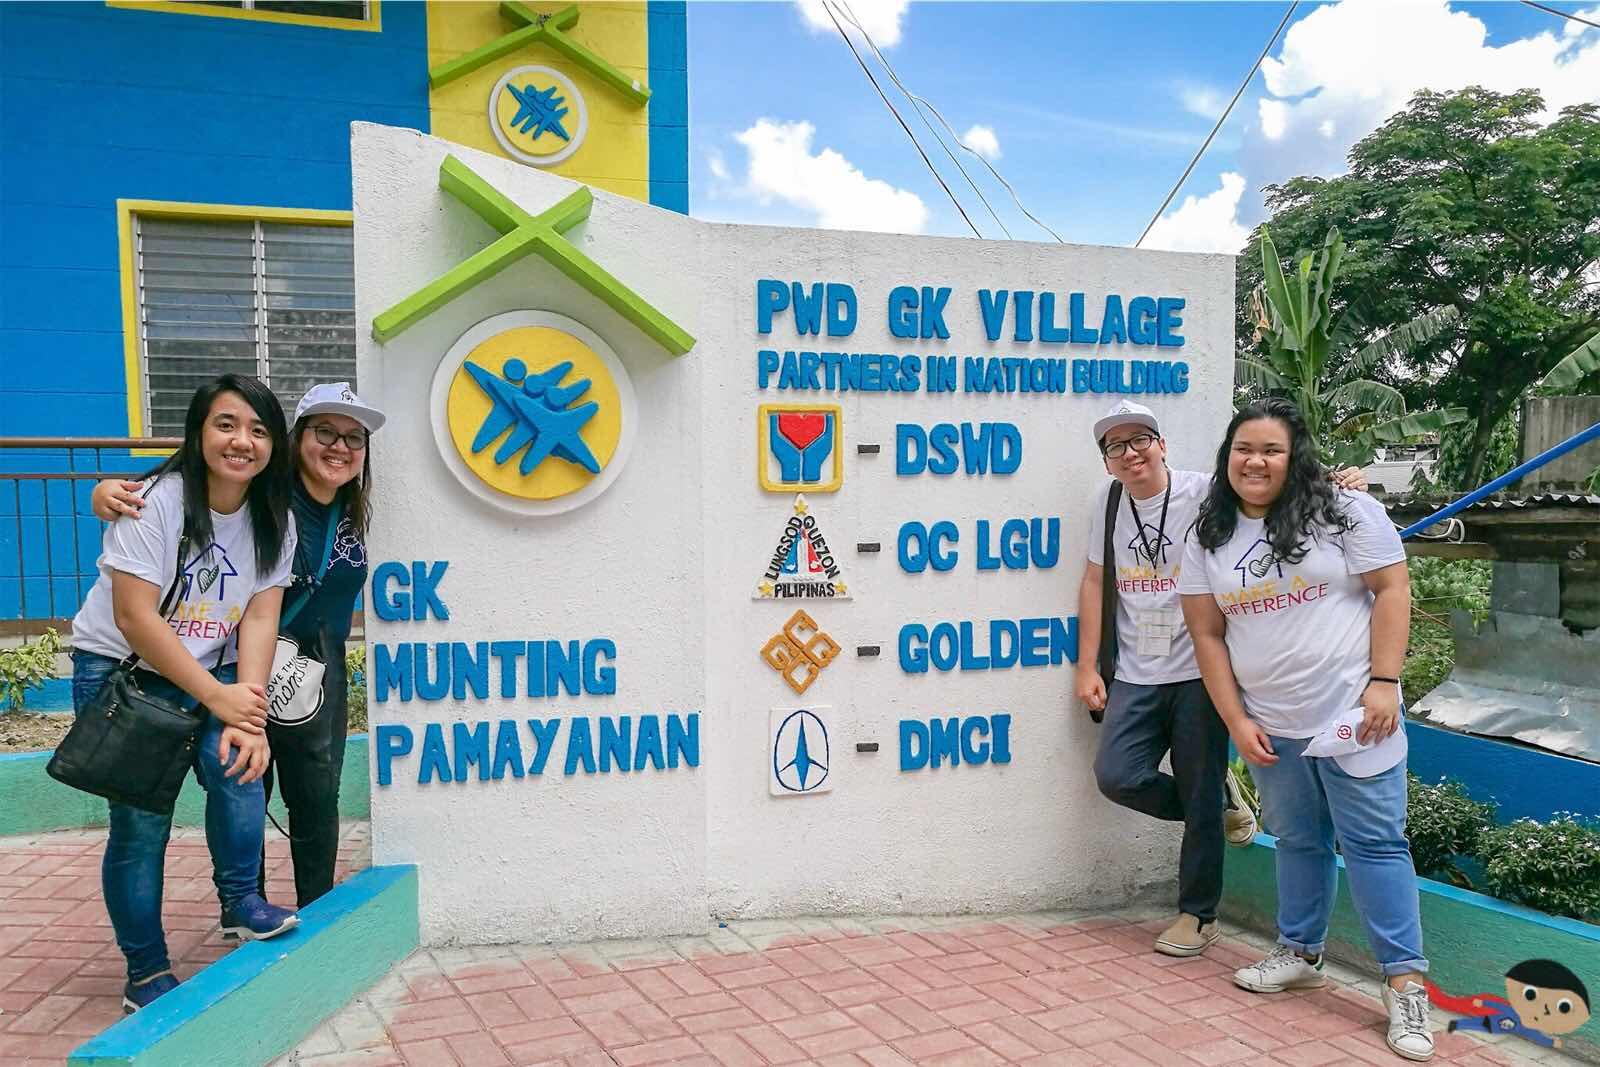 Renz Cheng in Gawad Kalingan Munting Pamayanan, Escopa 3, Project 4, Quezon City